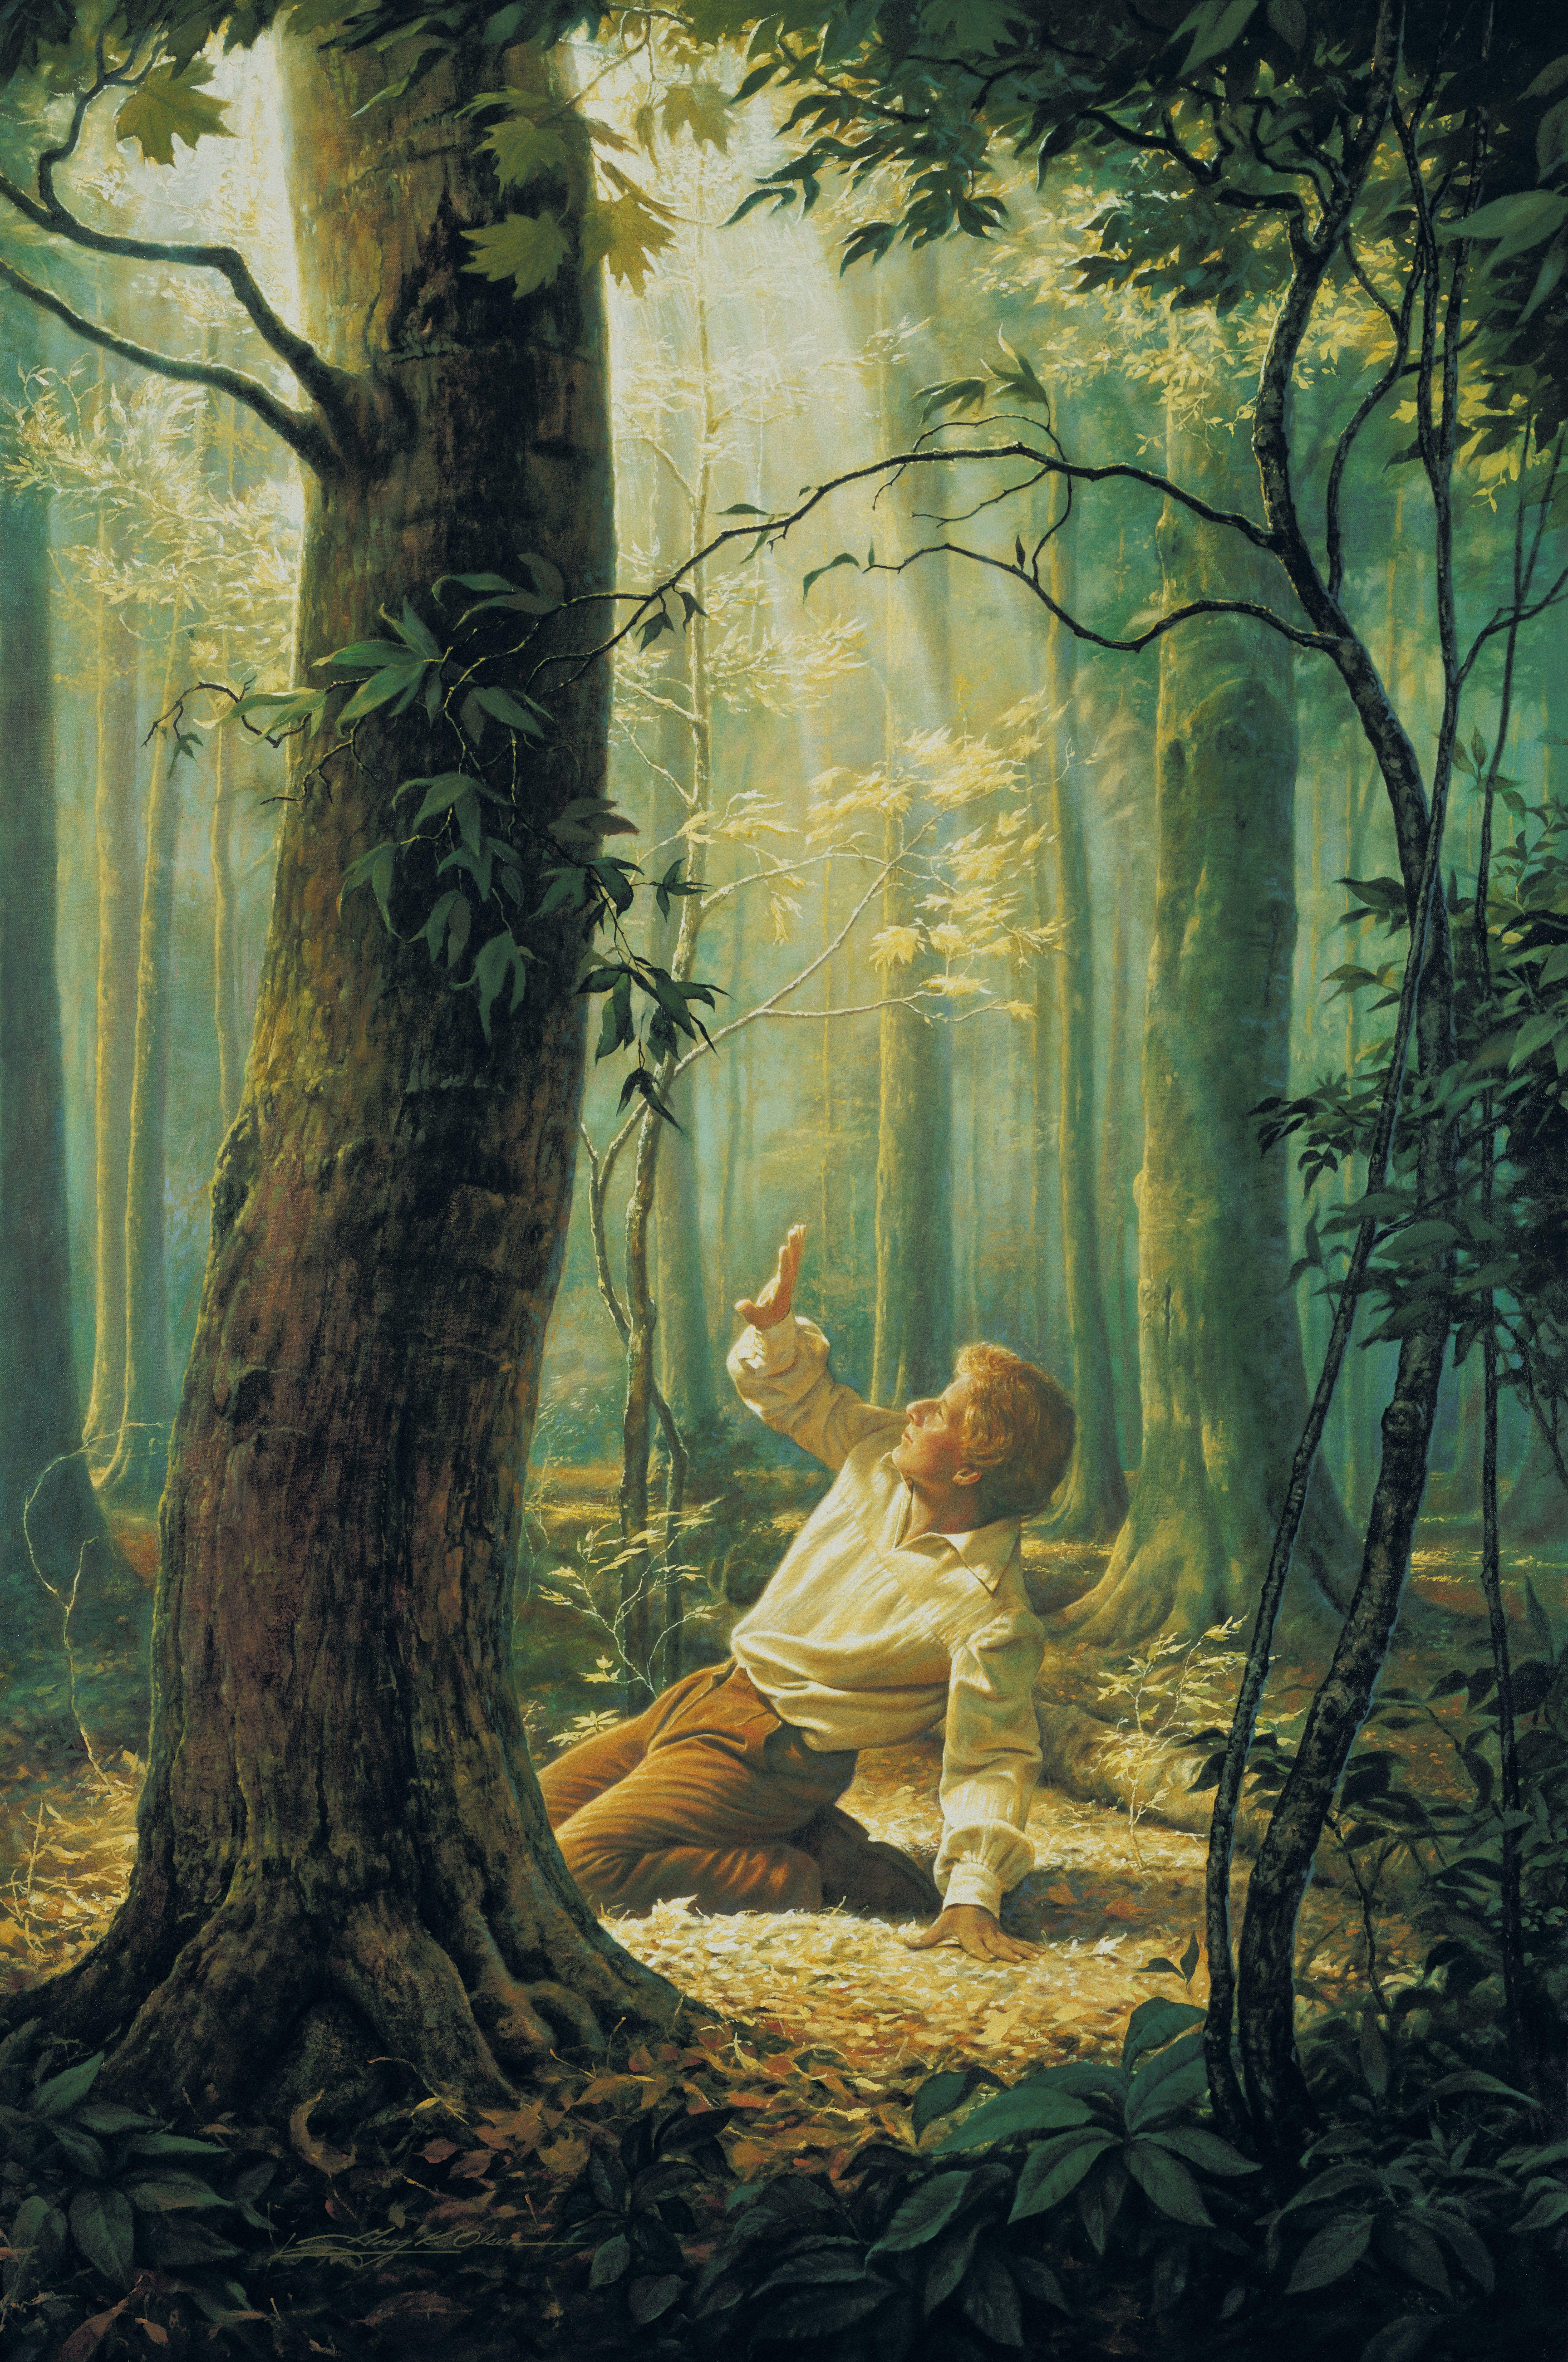 Joseph Smith's First Vision, by Greg K. Olsen.